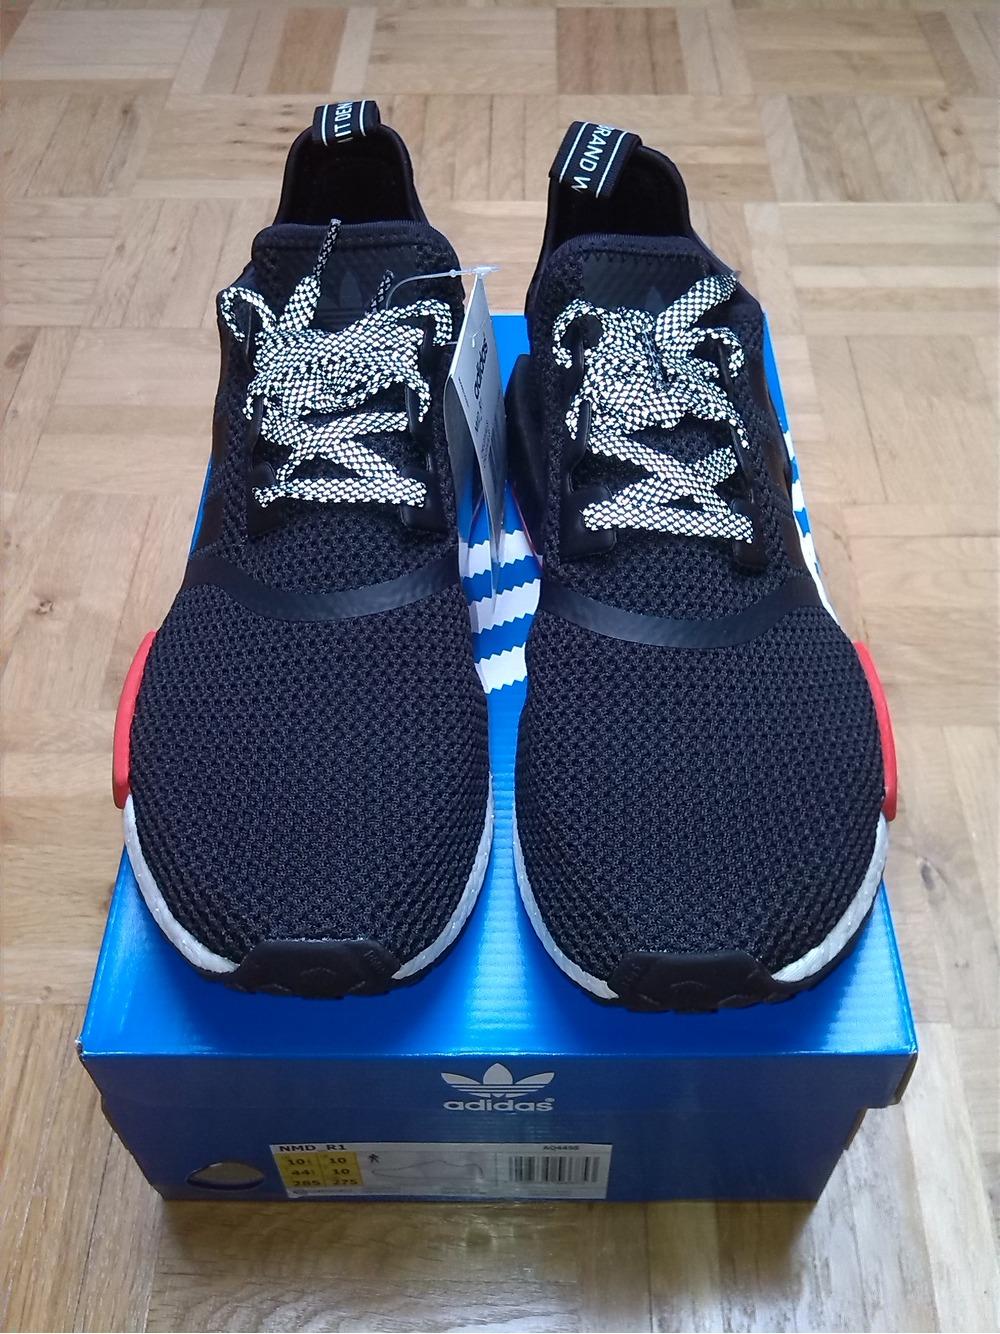 Adidas NMD Europe